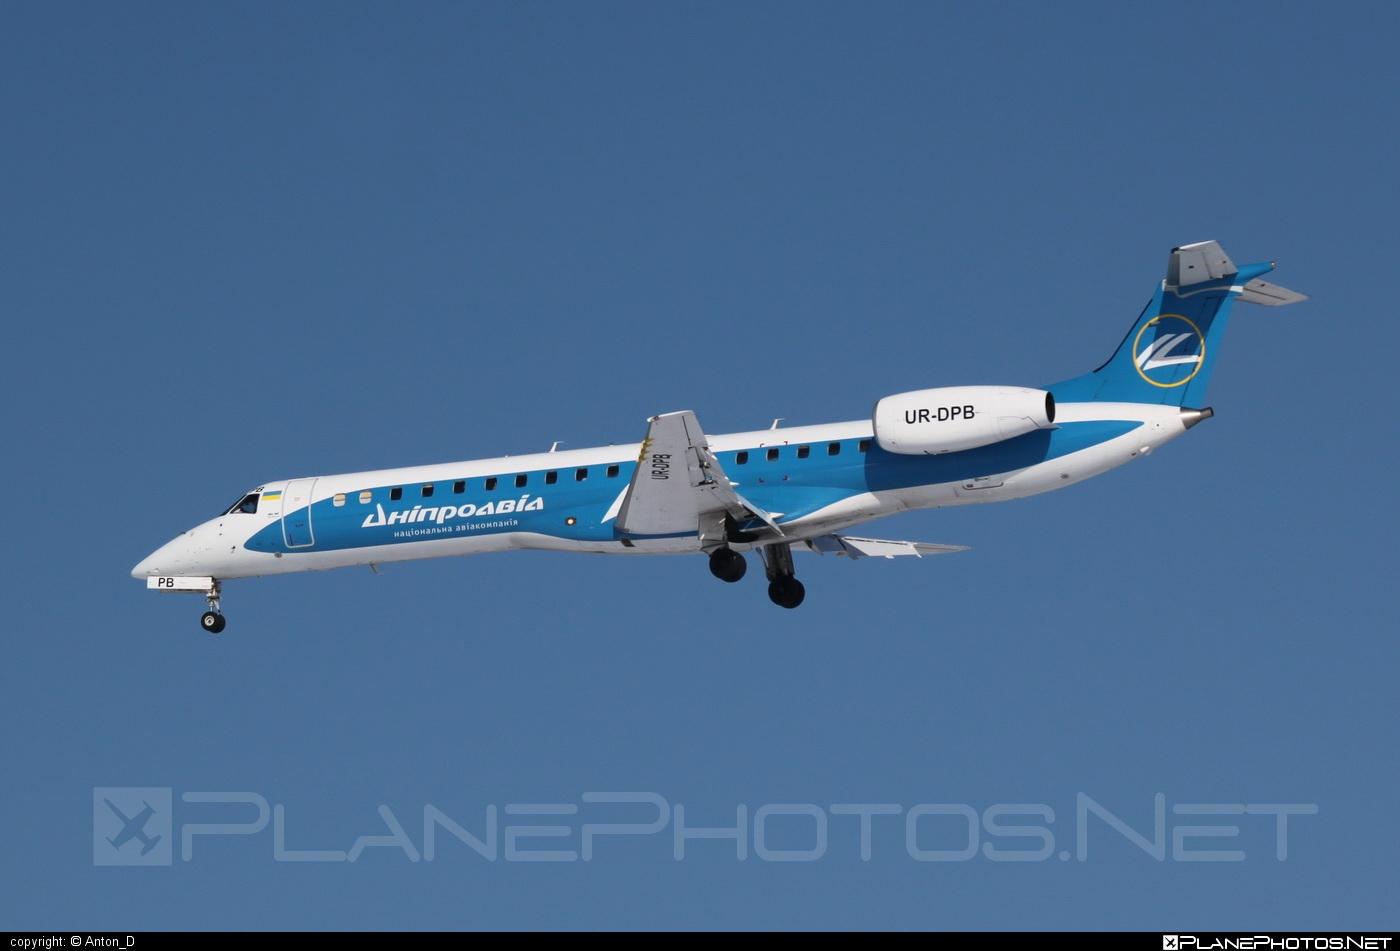 Embraer ERJ-145LR - UR-DPB operated by Dniproavia #embraer